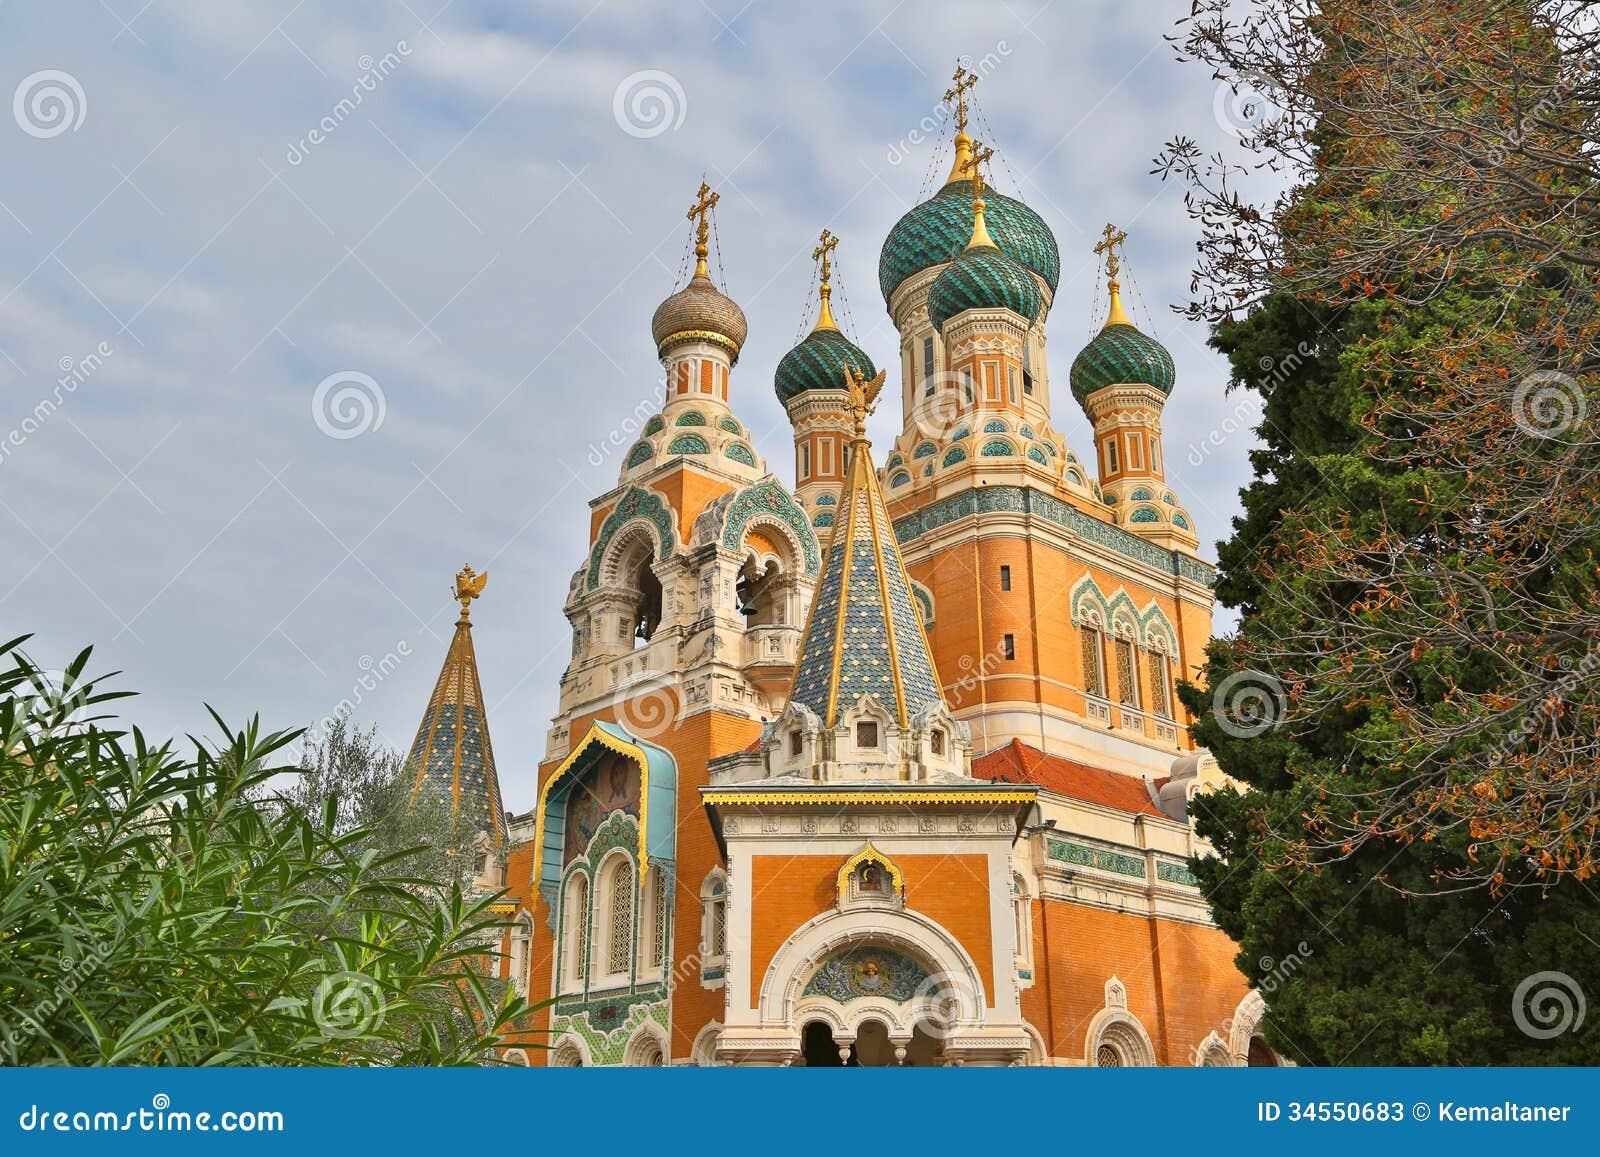 In France Russian 3